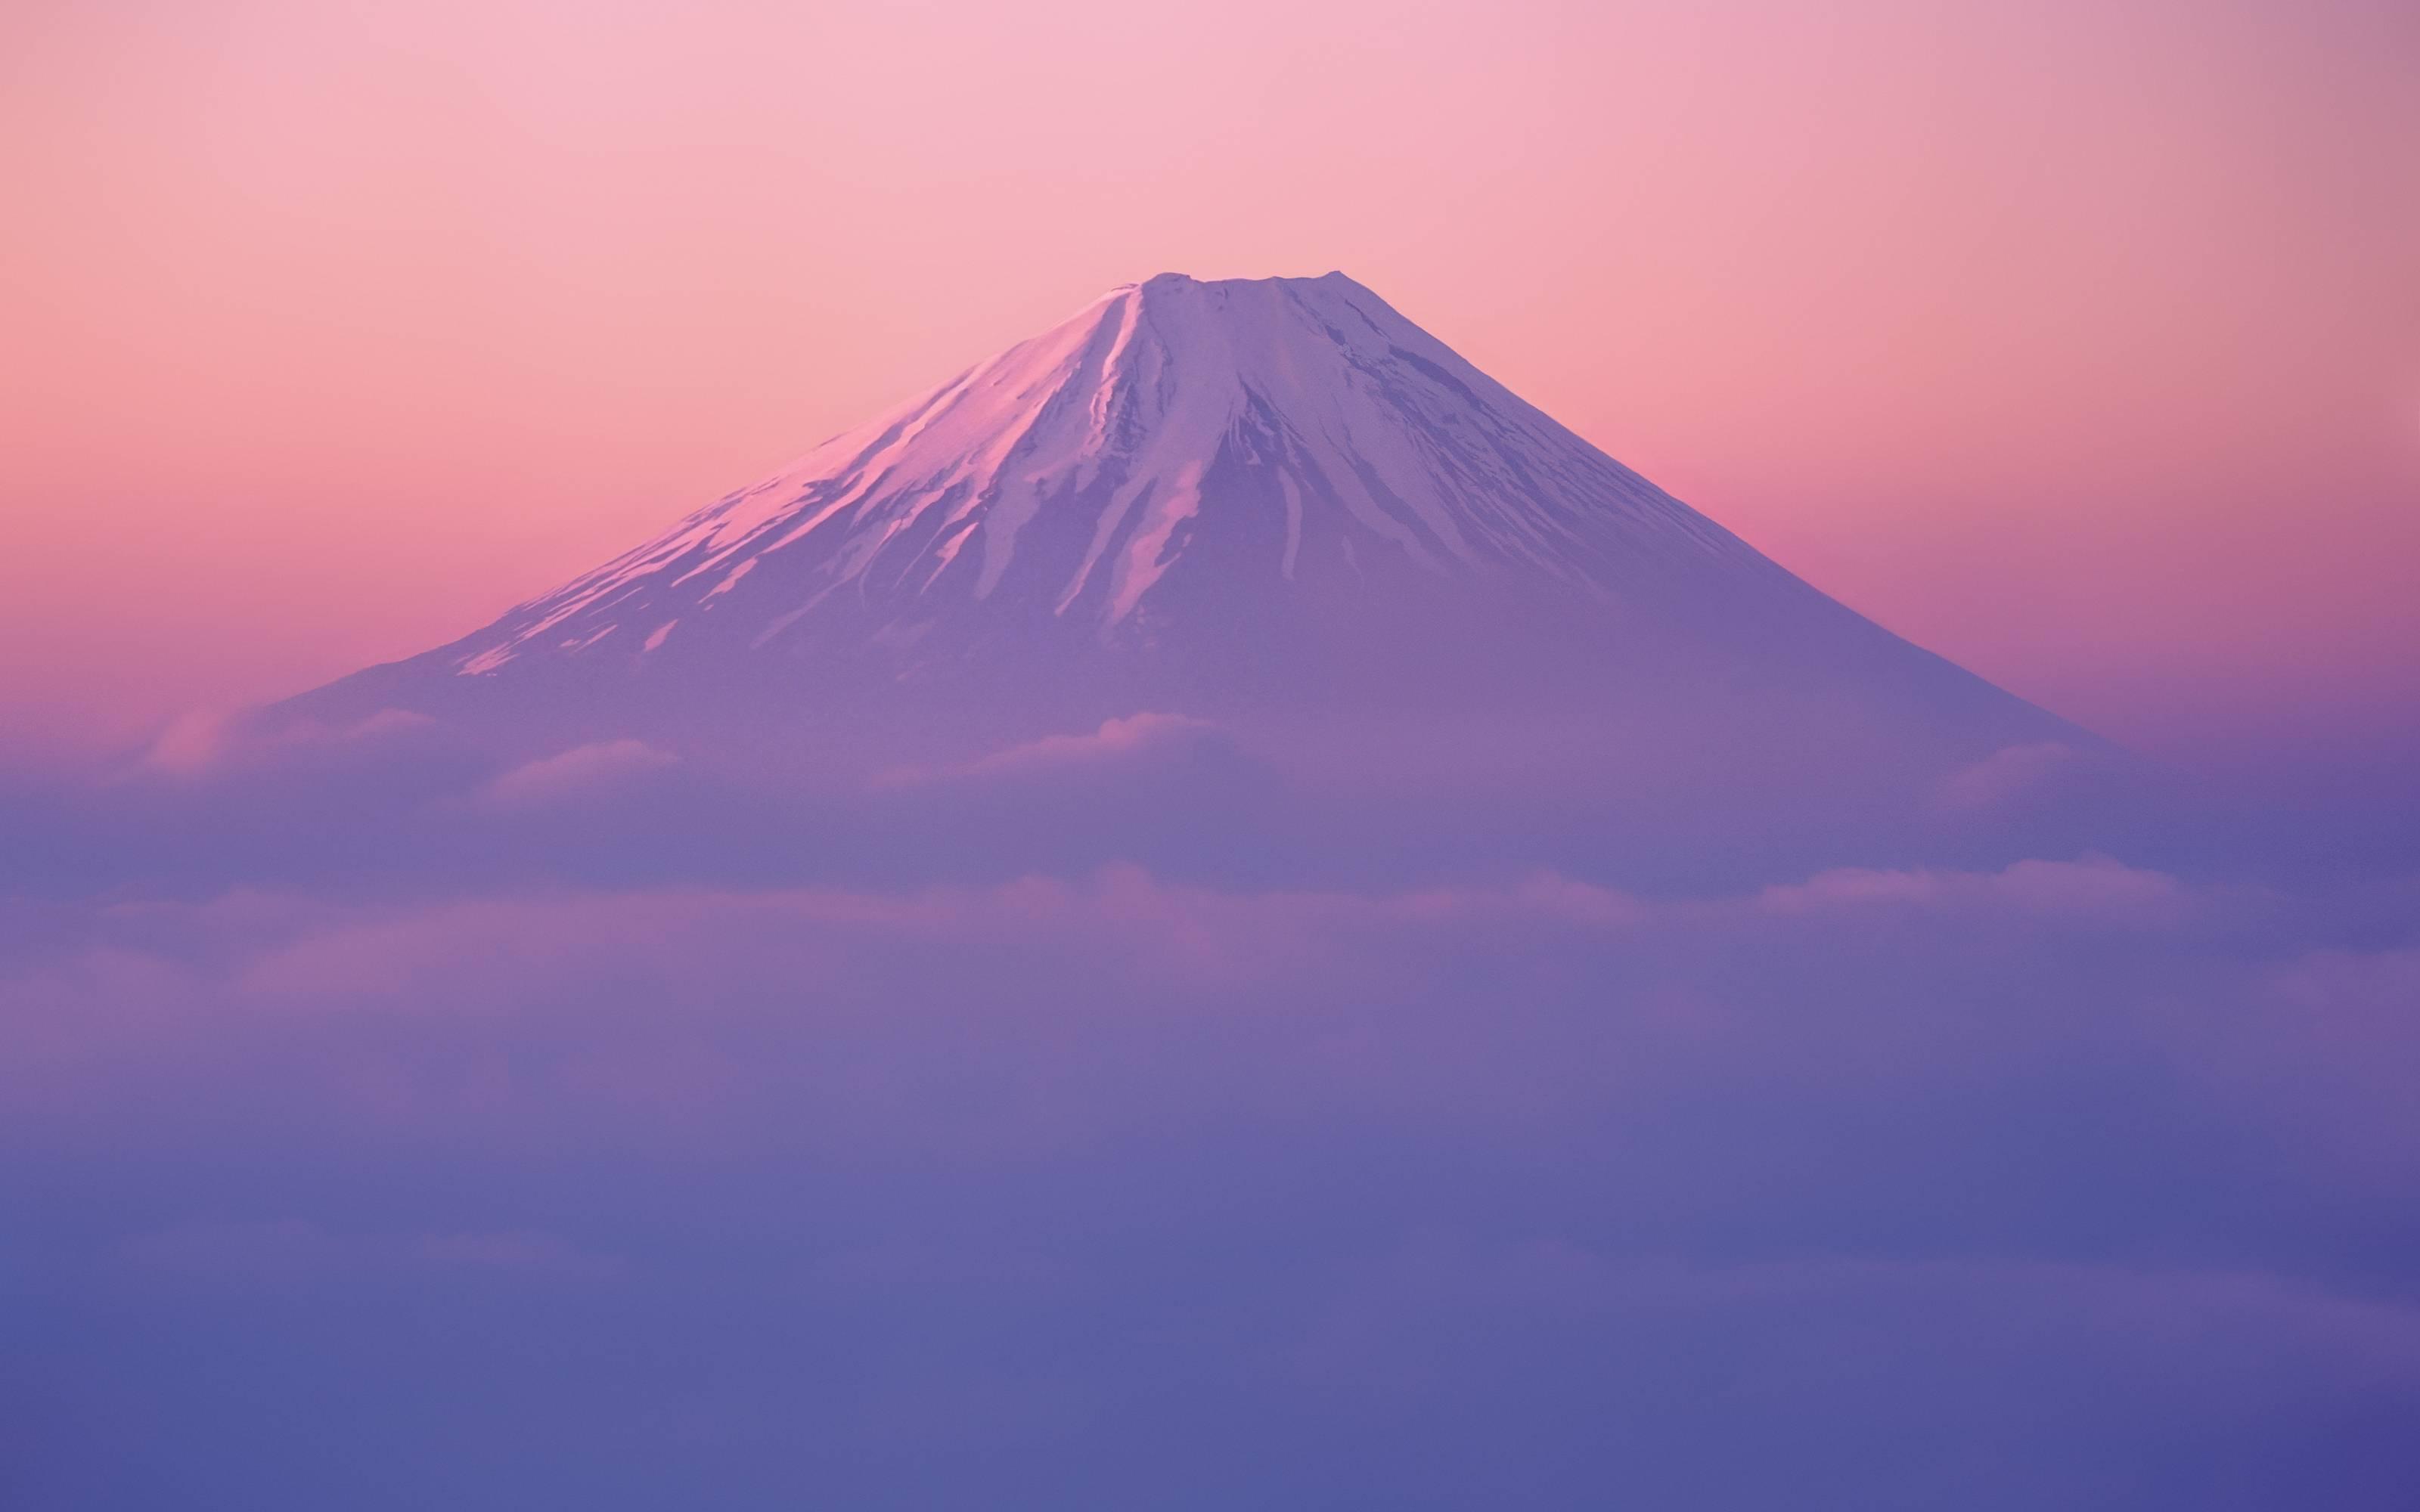 New Mt Fuji Wallpaper in Mac OS X Lion Developer Preview 2 3200x2000